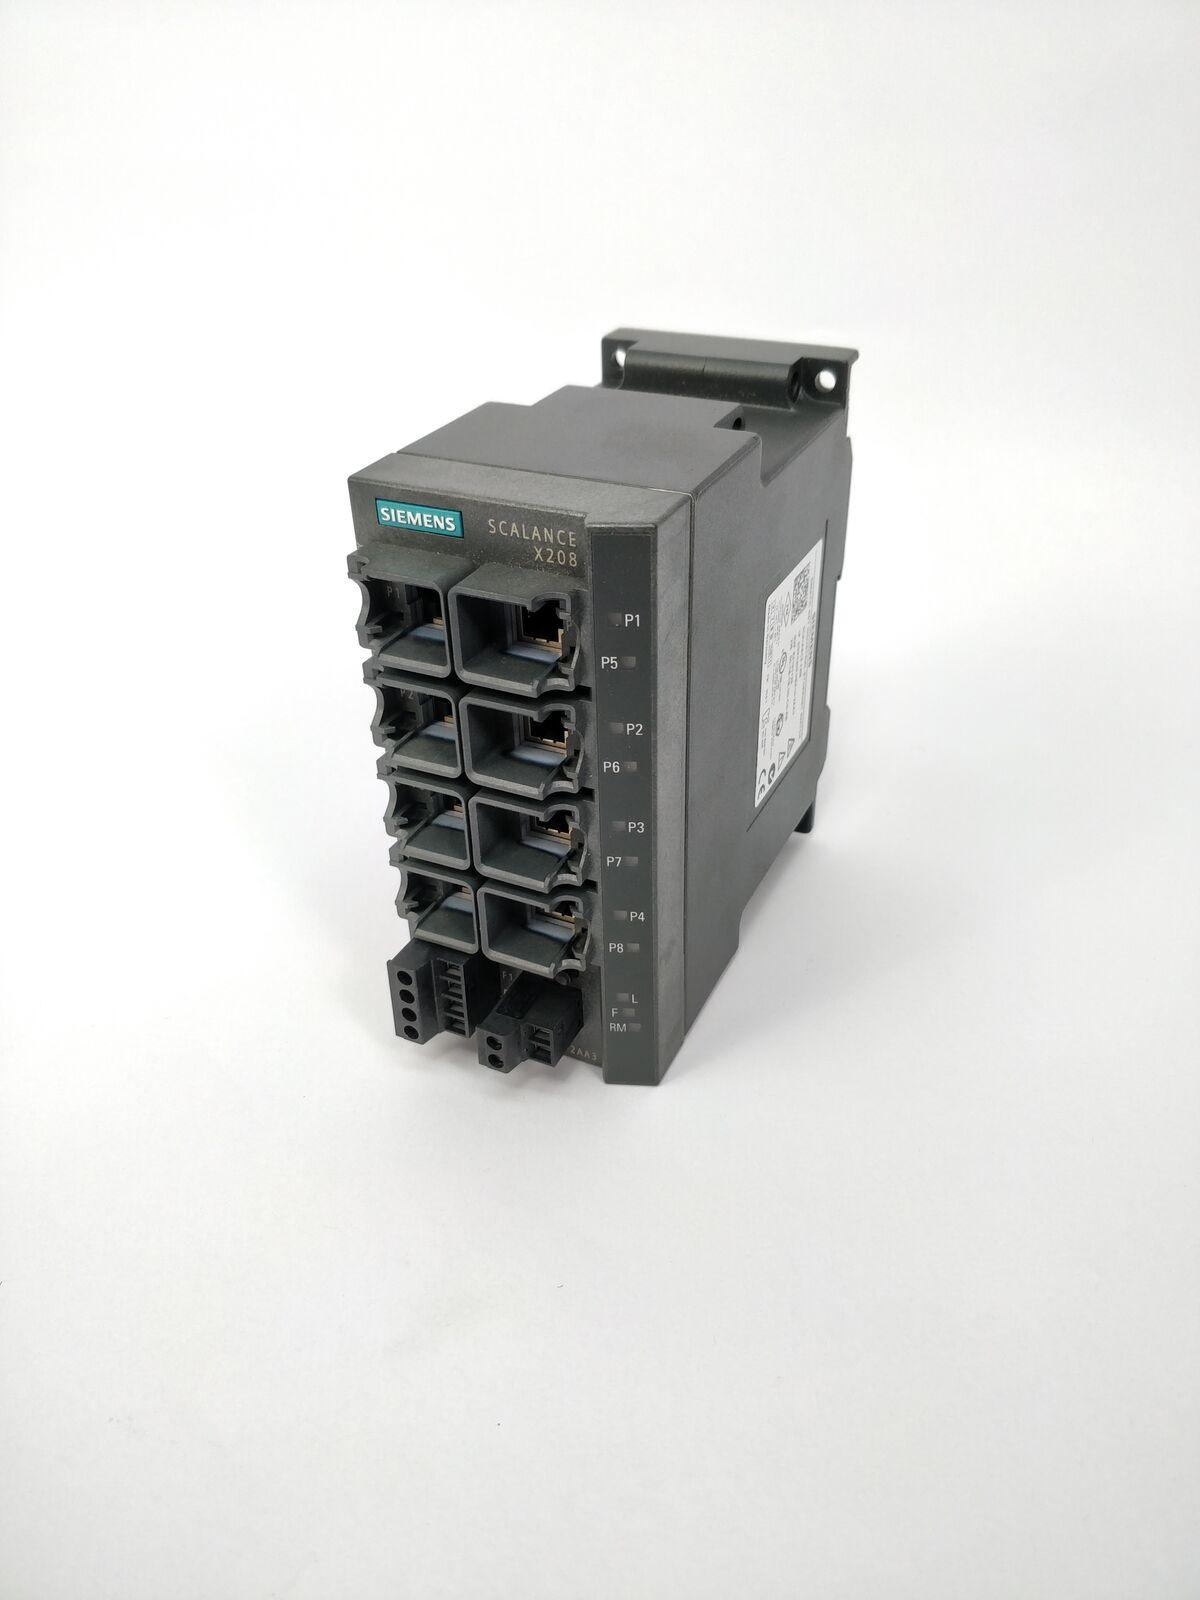 SIEMENS Used 6GK5208-0BA10-2AA3 NET INDUSTRIAL ETHER SWITCH PLC-I-634=7C32